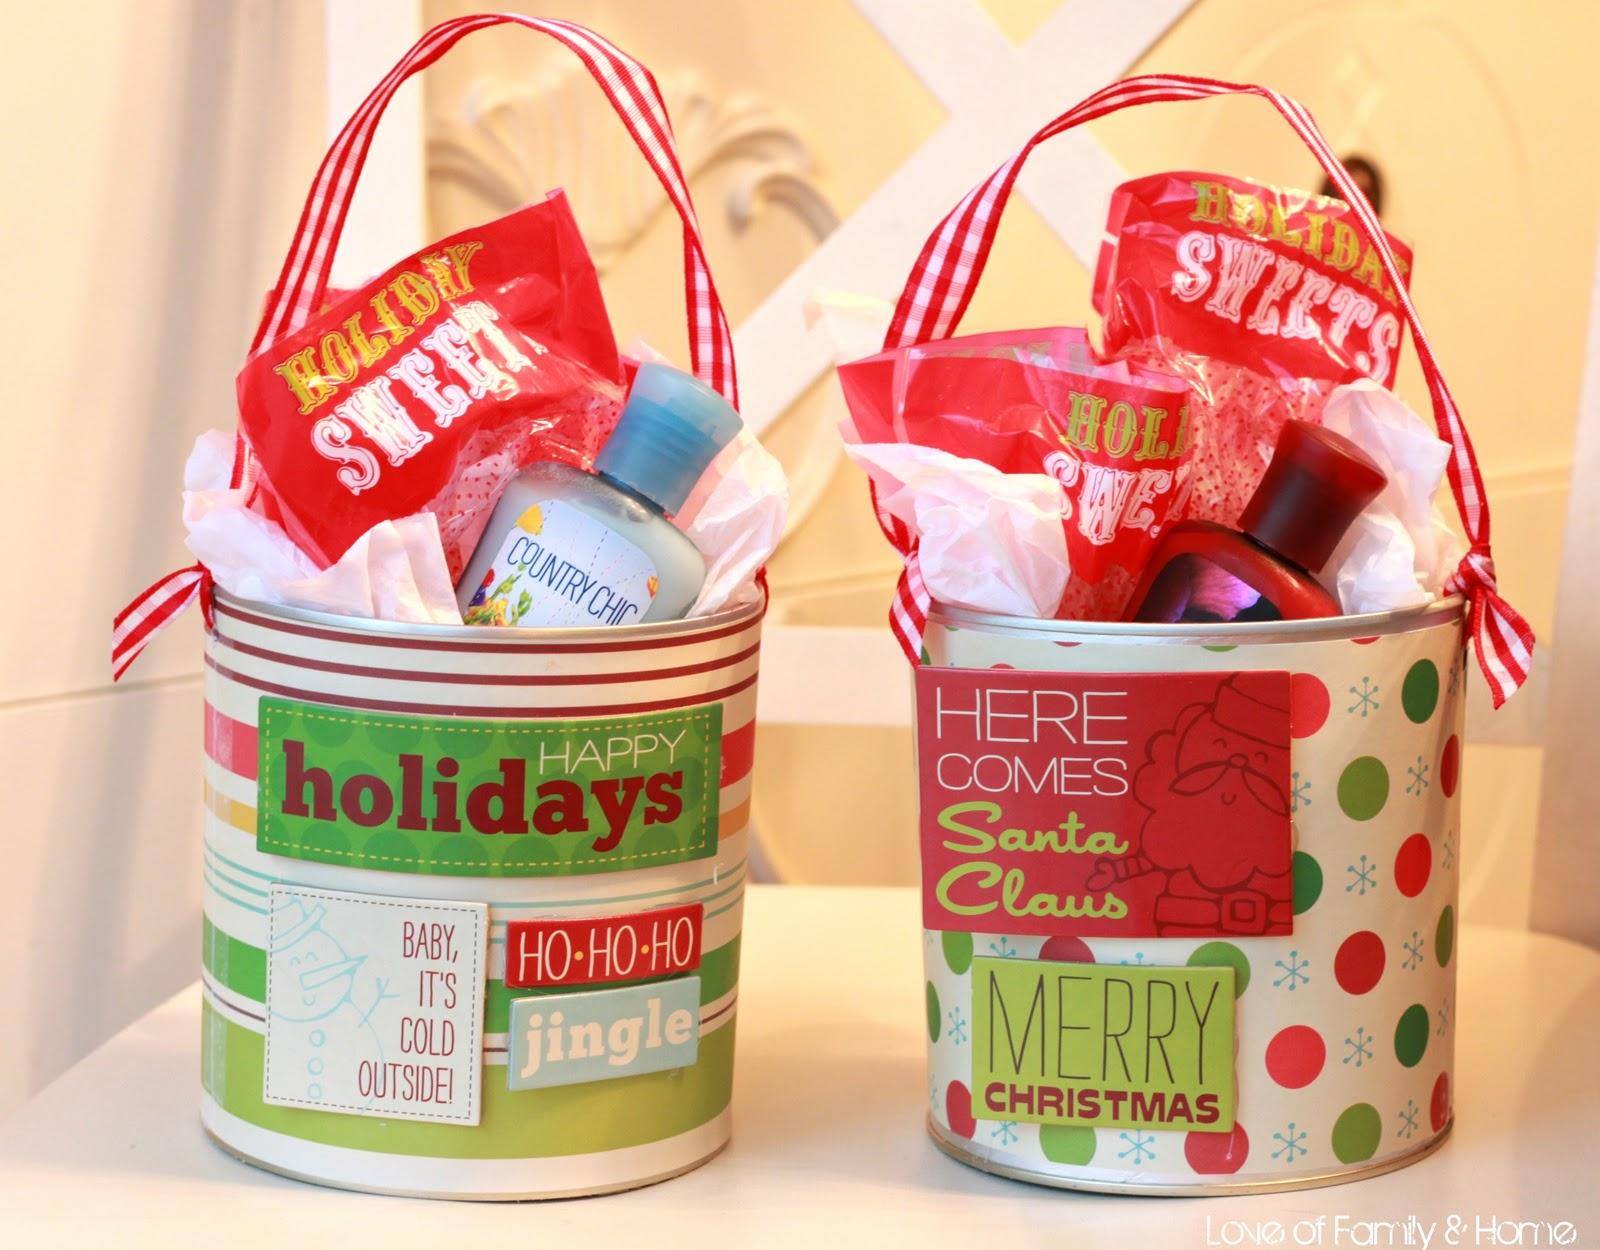 Last Minute Teacher's Christmas Gifts.....